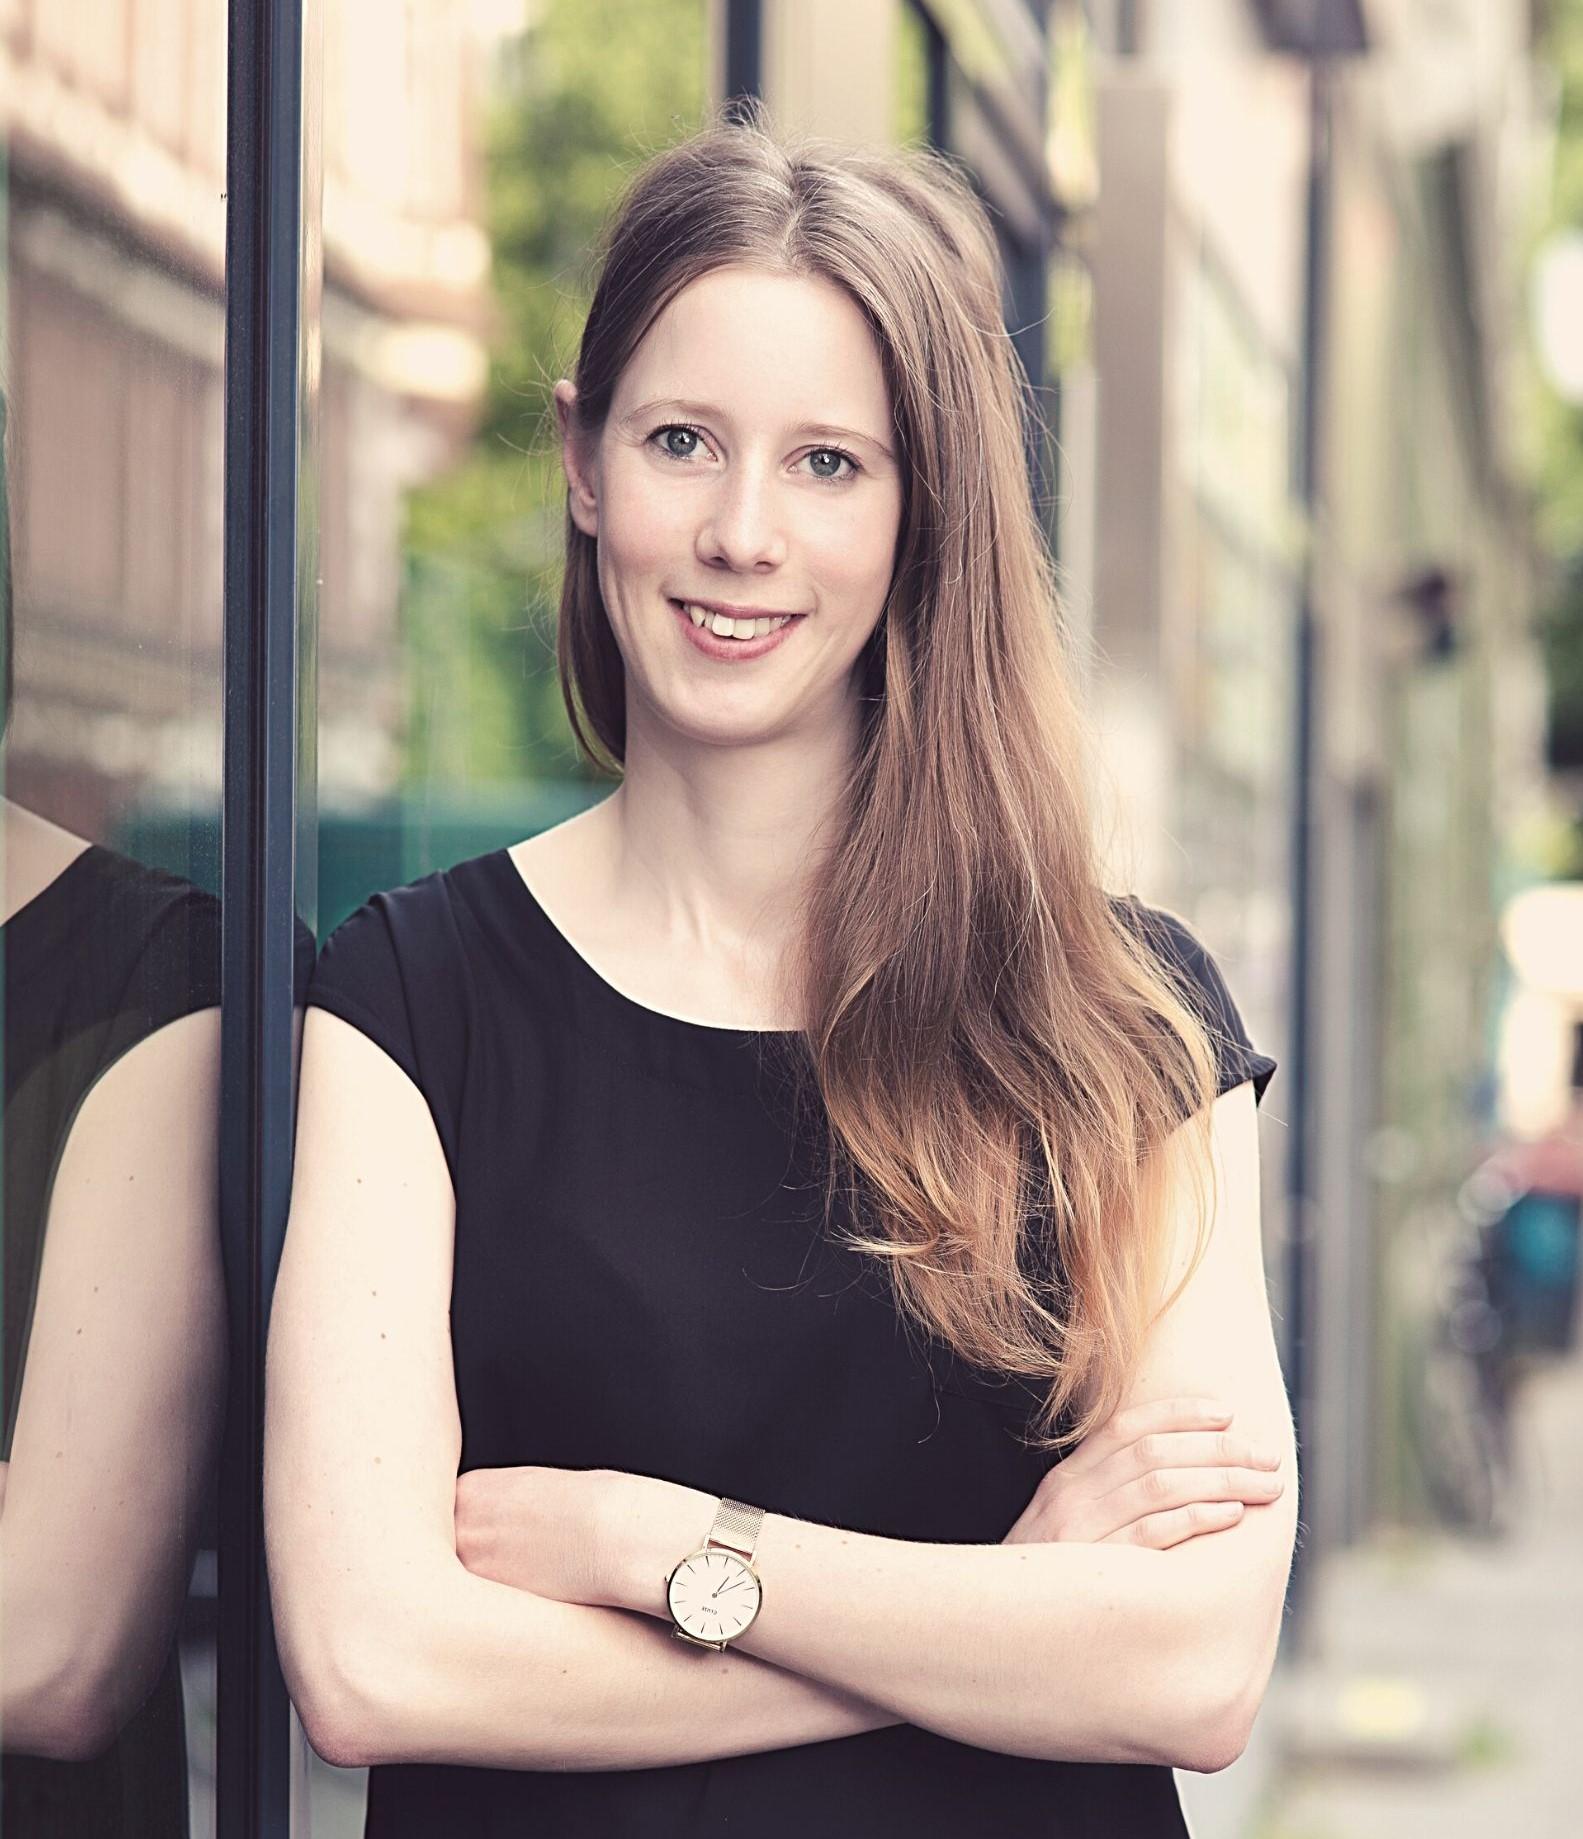 Vivien Nikolic Freier Texter Nachhaltigkeit